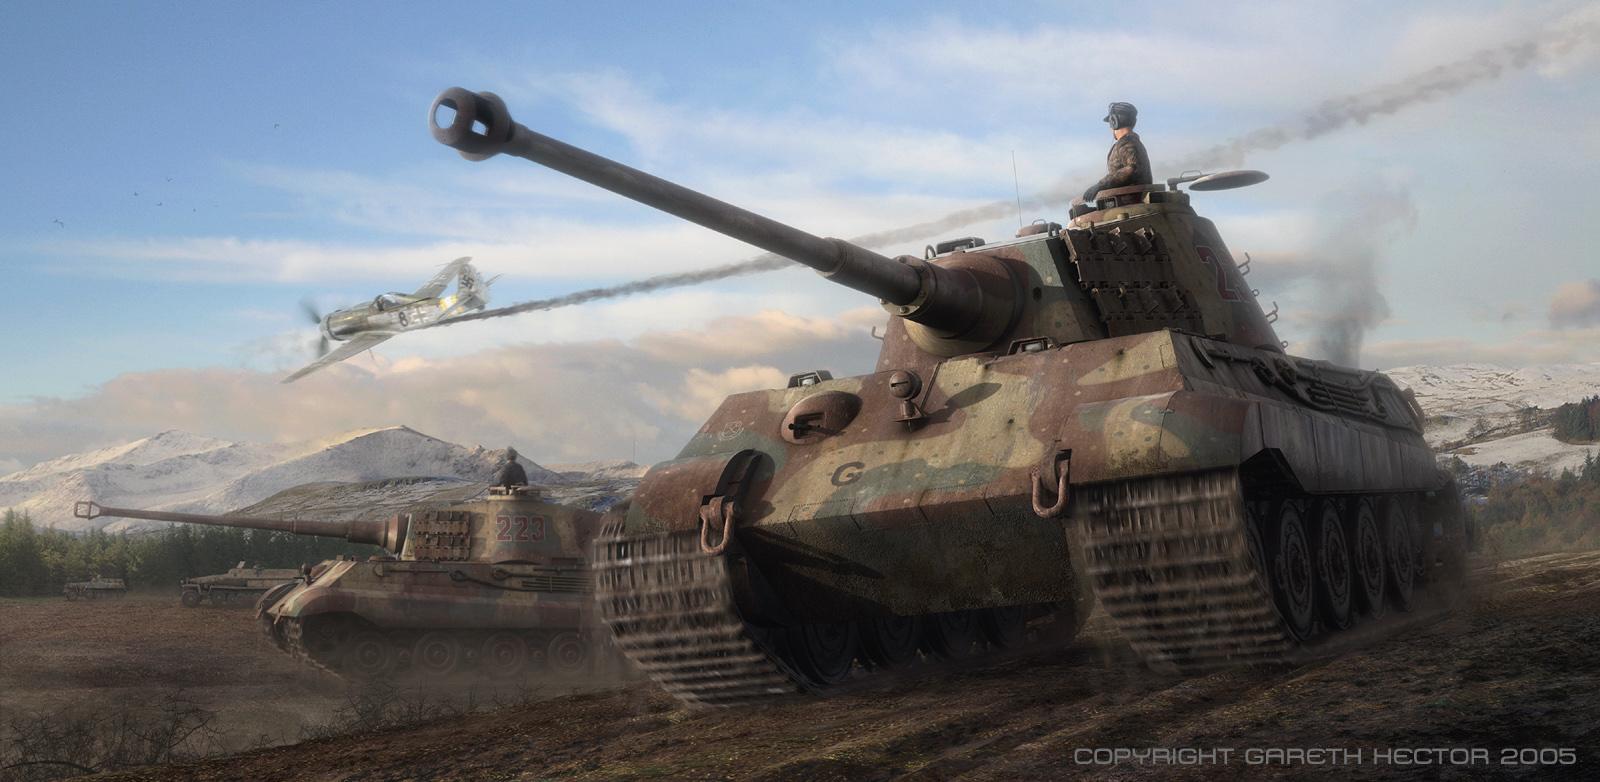 King Tiger Tank Wallpaper - WallpaperSafari